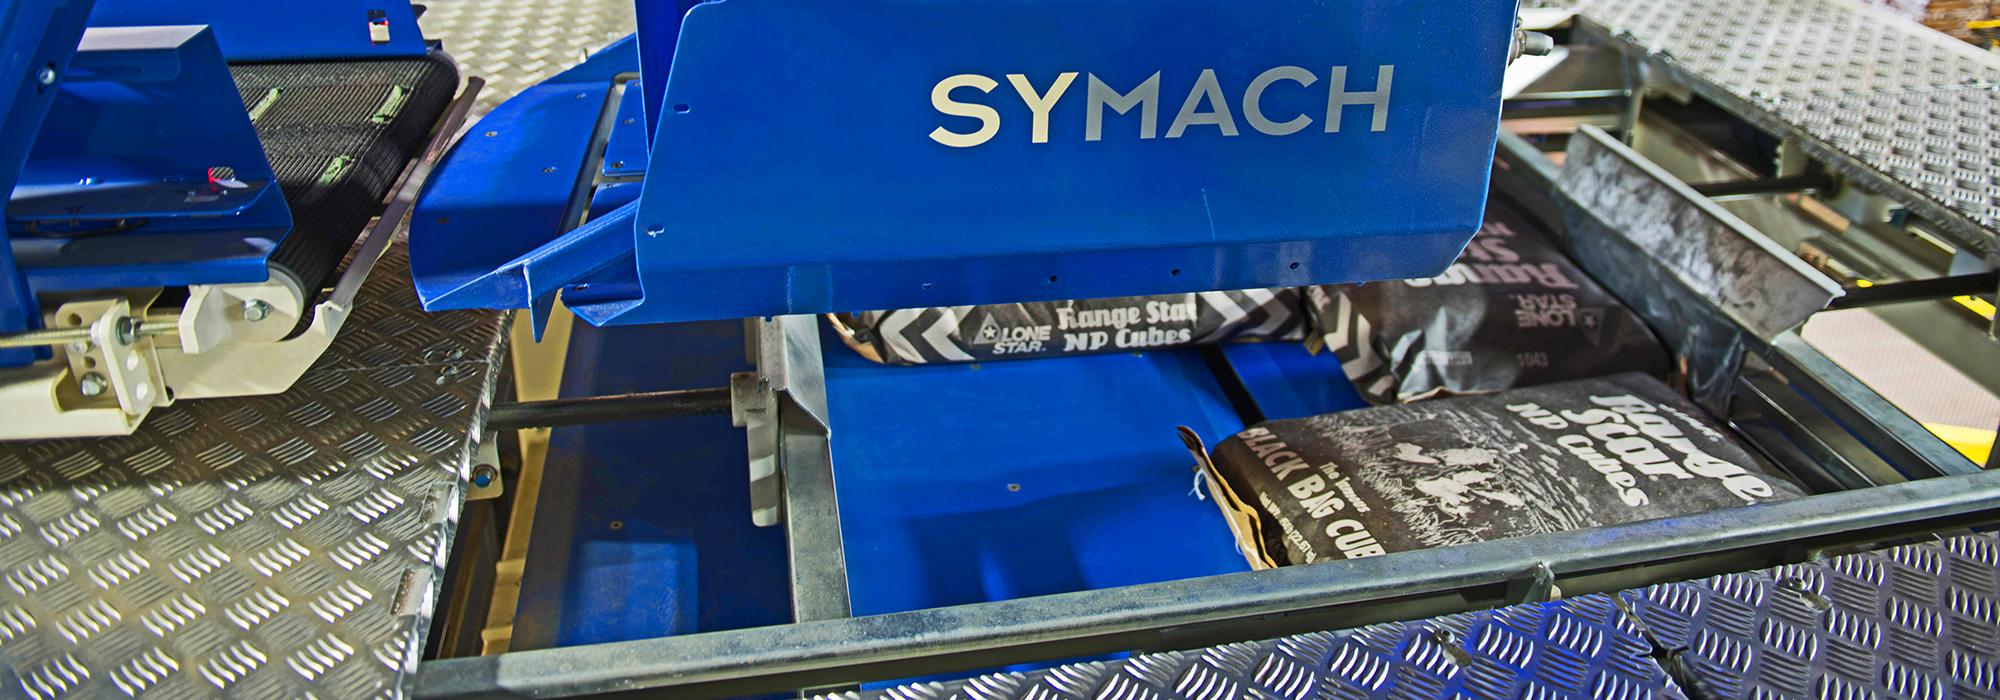 symach-5-2